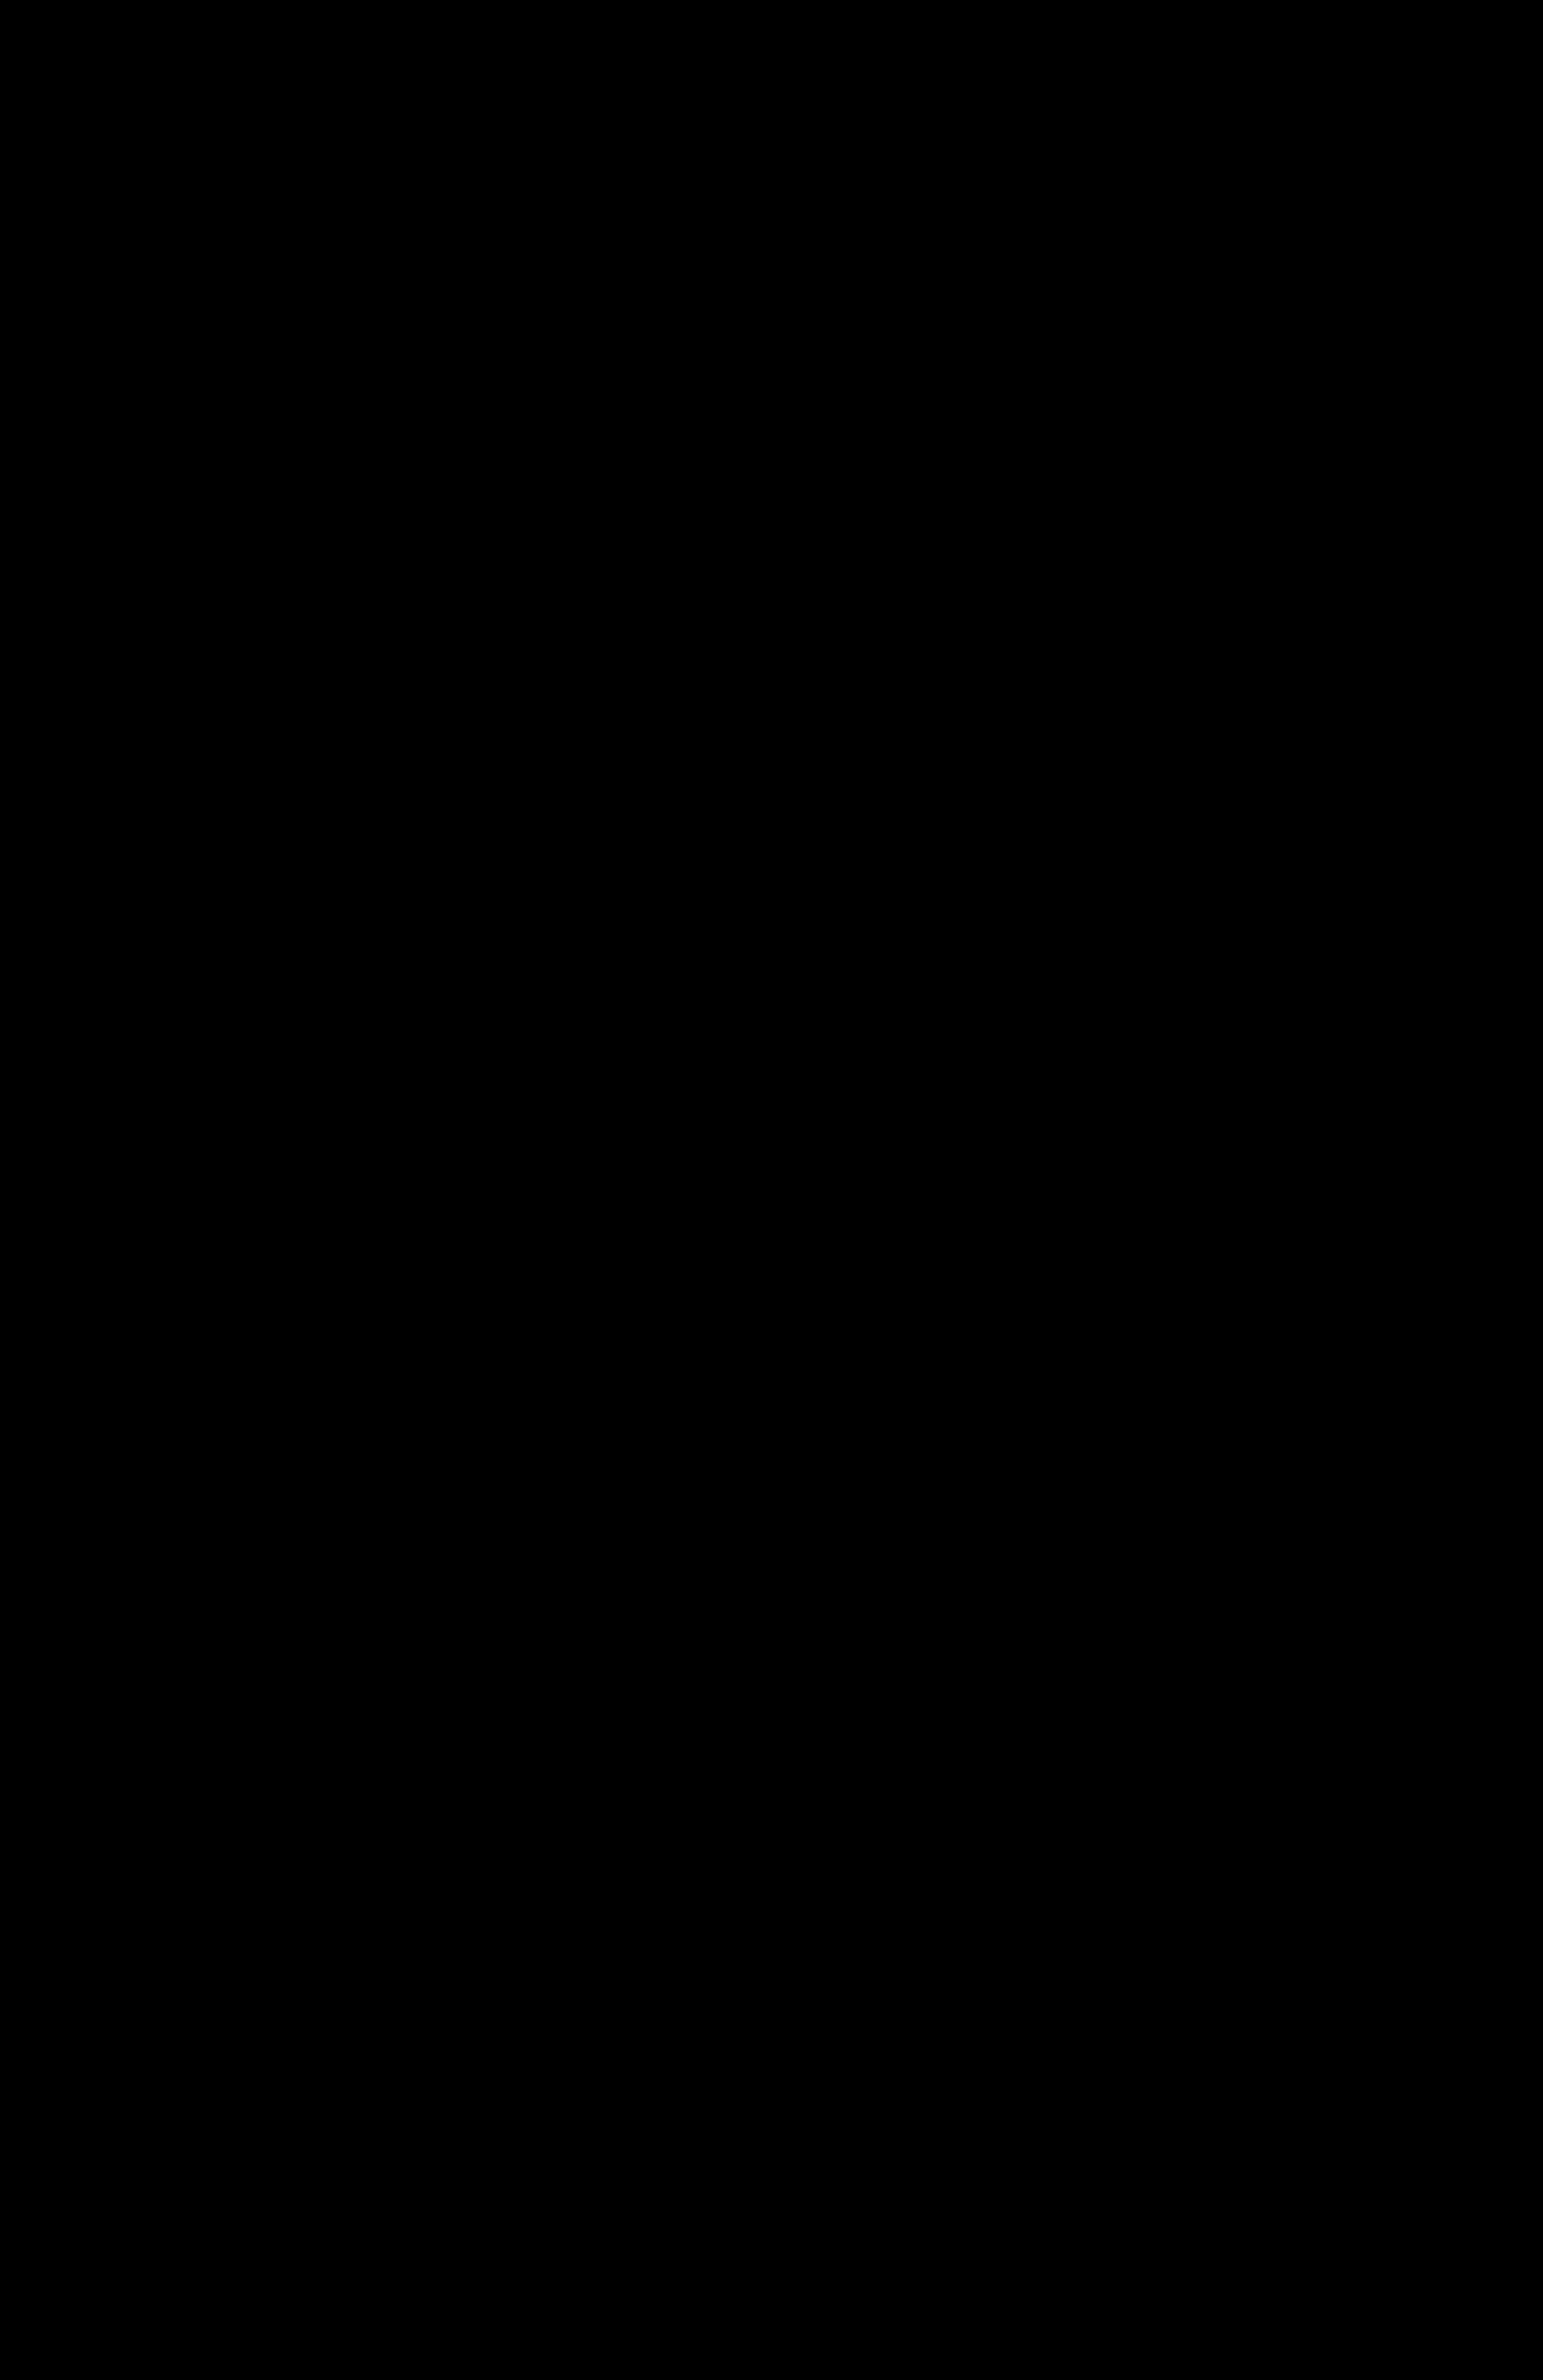 vector transparent library Risultati immagini per light bulb drawing